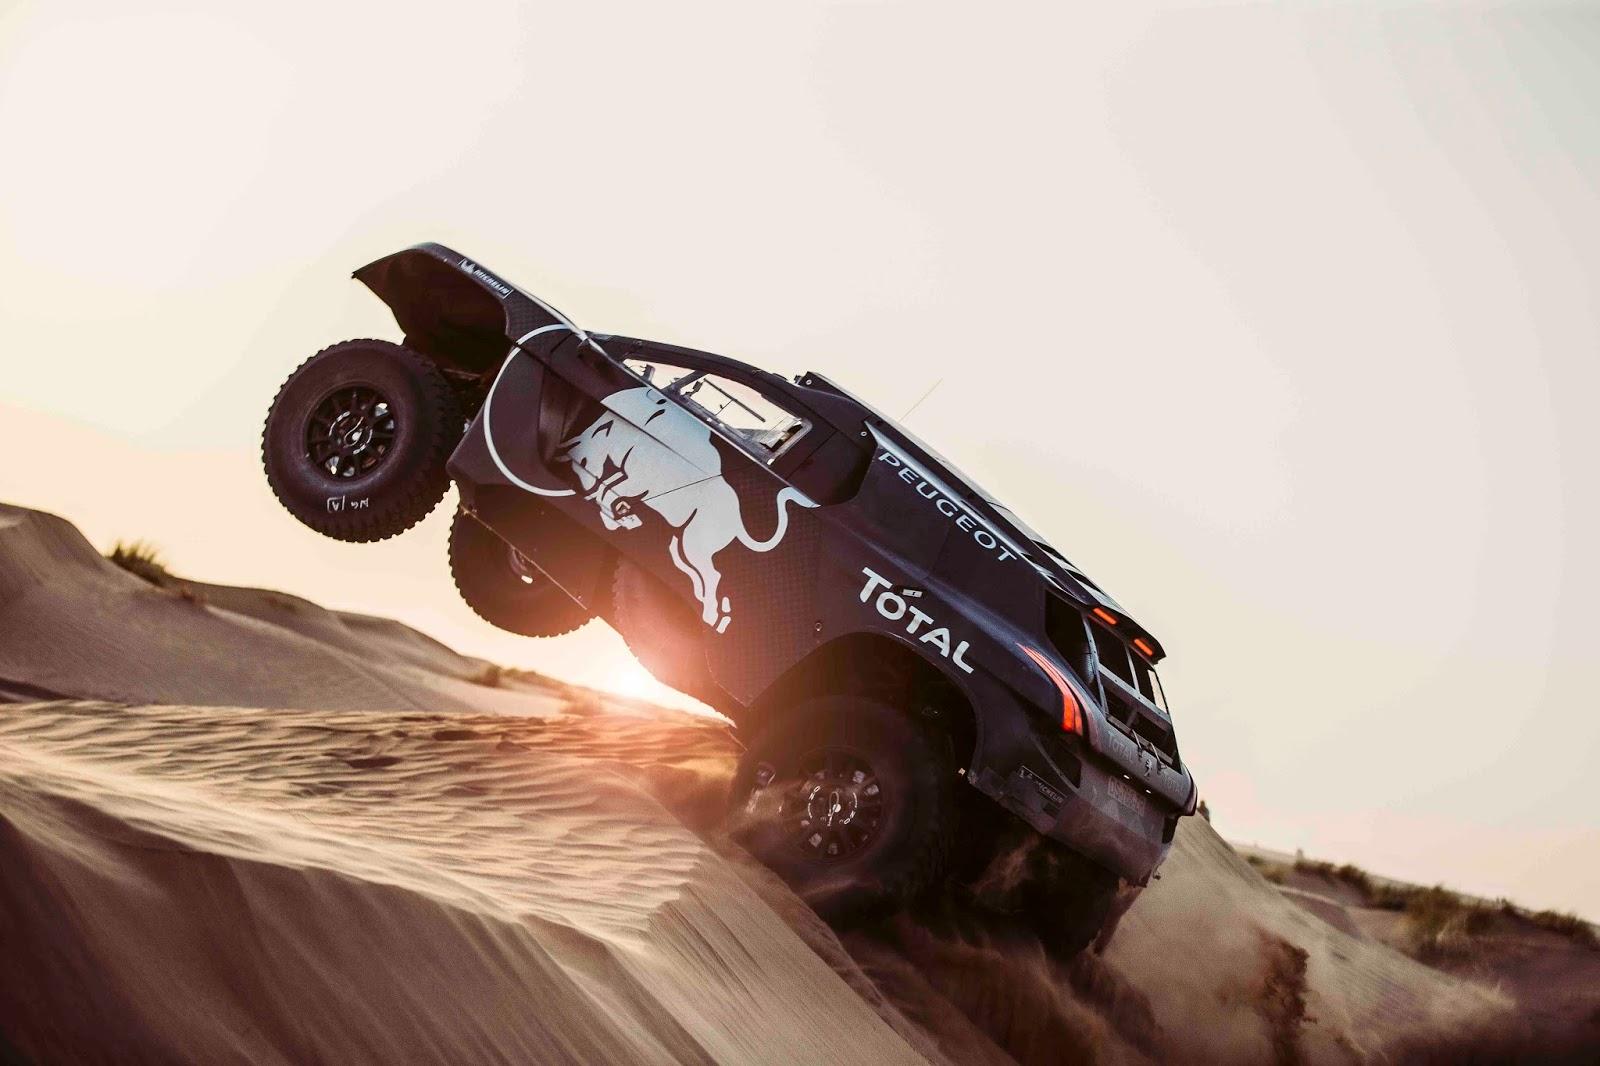 FD 150914 Peugeot Test in Morocco 0031 Το θηριώδες Peugeot 2008 DKR16 επιστρέφει Peugeot, Peugeot 2008, Peugeot 2008 DKR16, Rally, Rally Dakar, videos